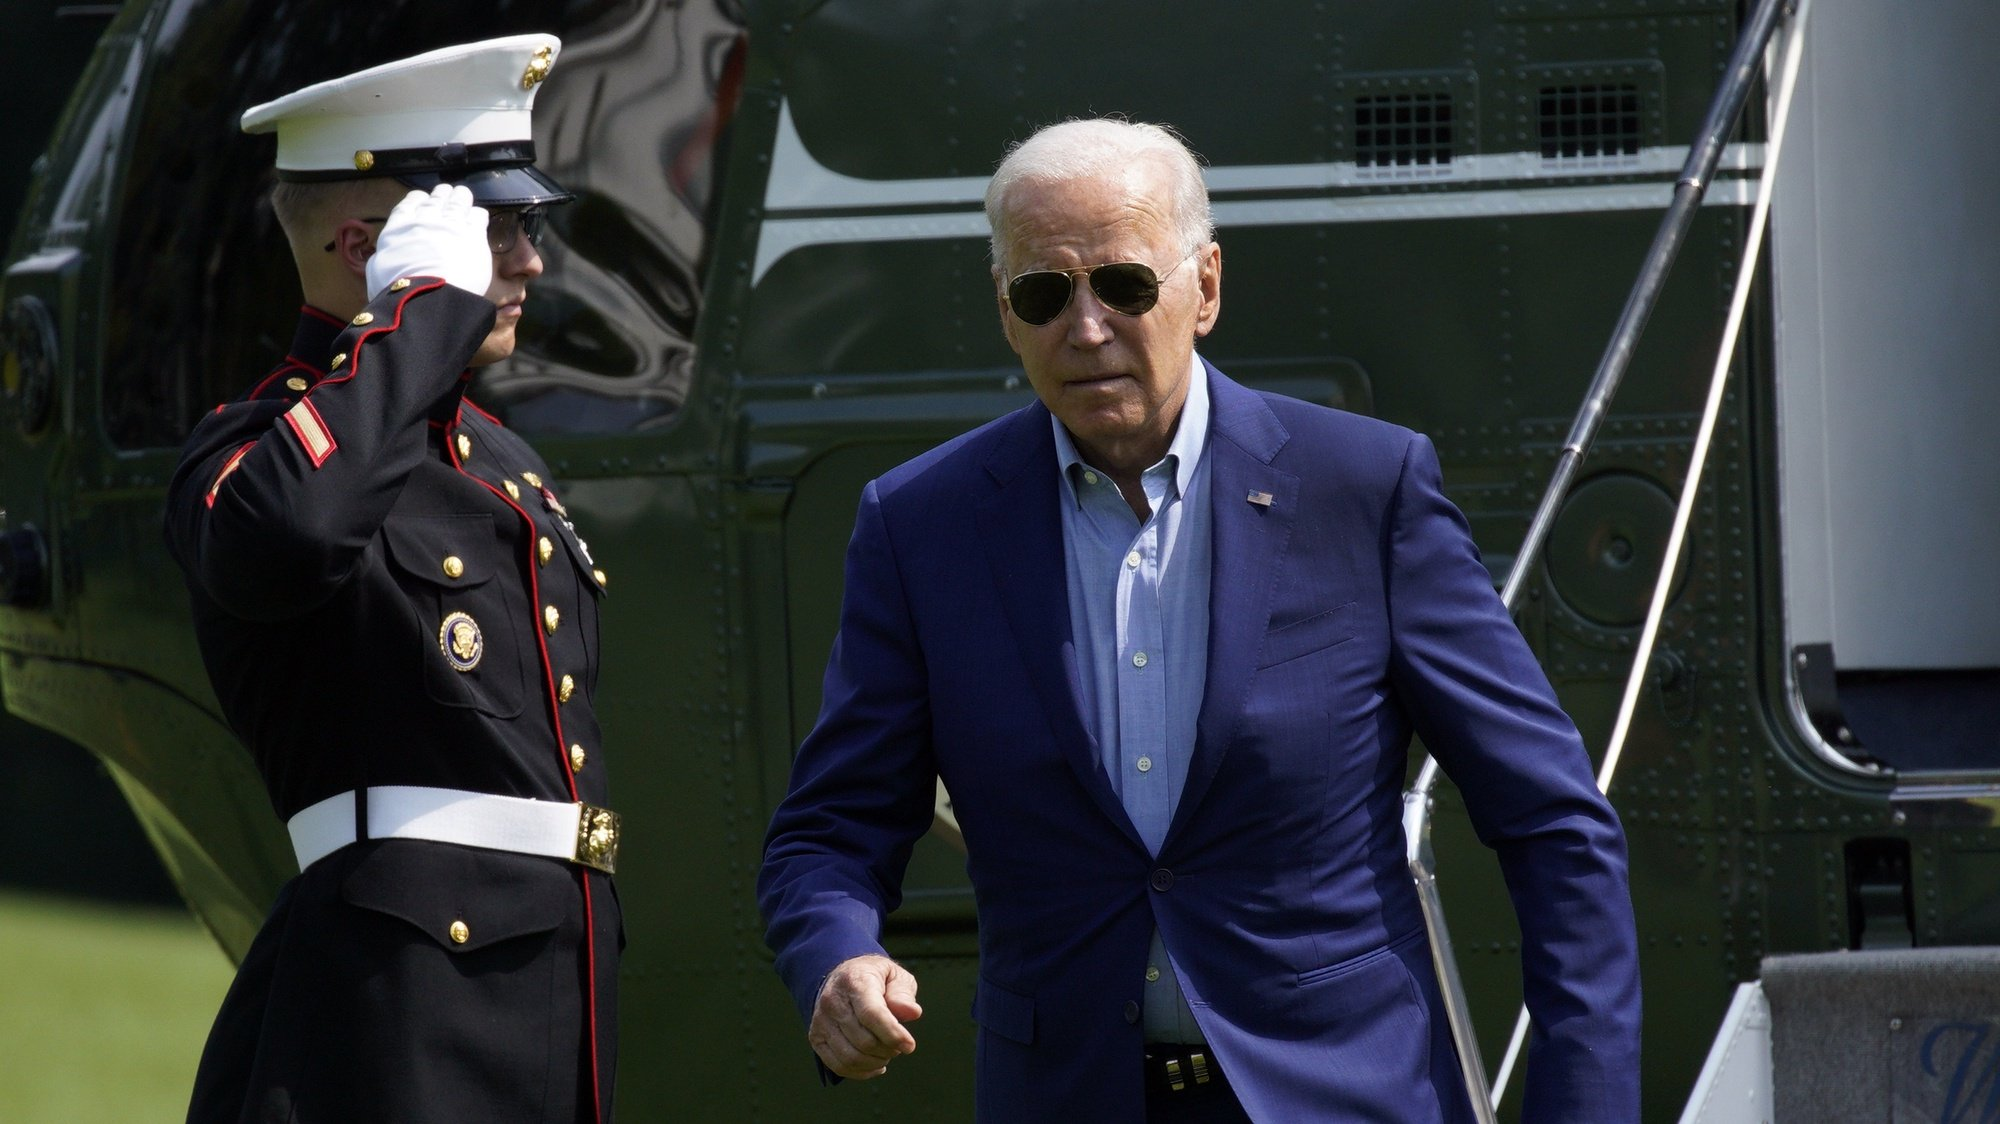 epa09365528 US President Joe Biden walks on the South Lawn of the White House upon his return from Delaware to Washington, DC, USA, 25 July 2021.  EPA/Yuri Gripas / POOL